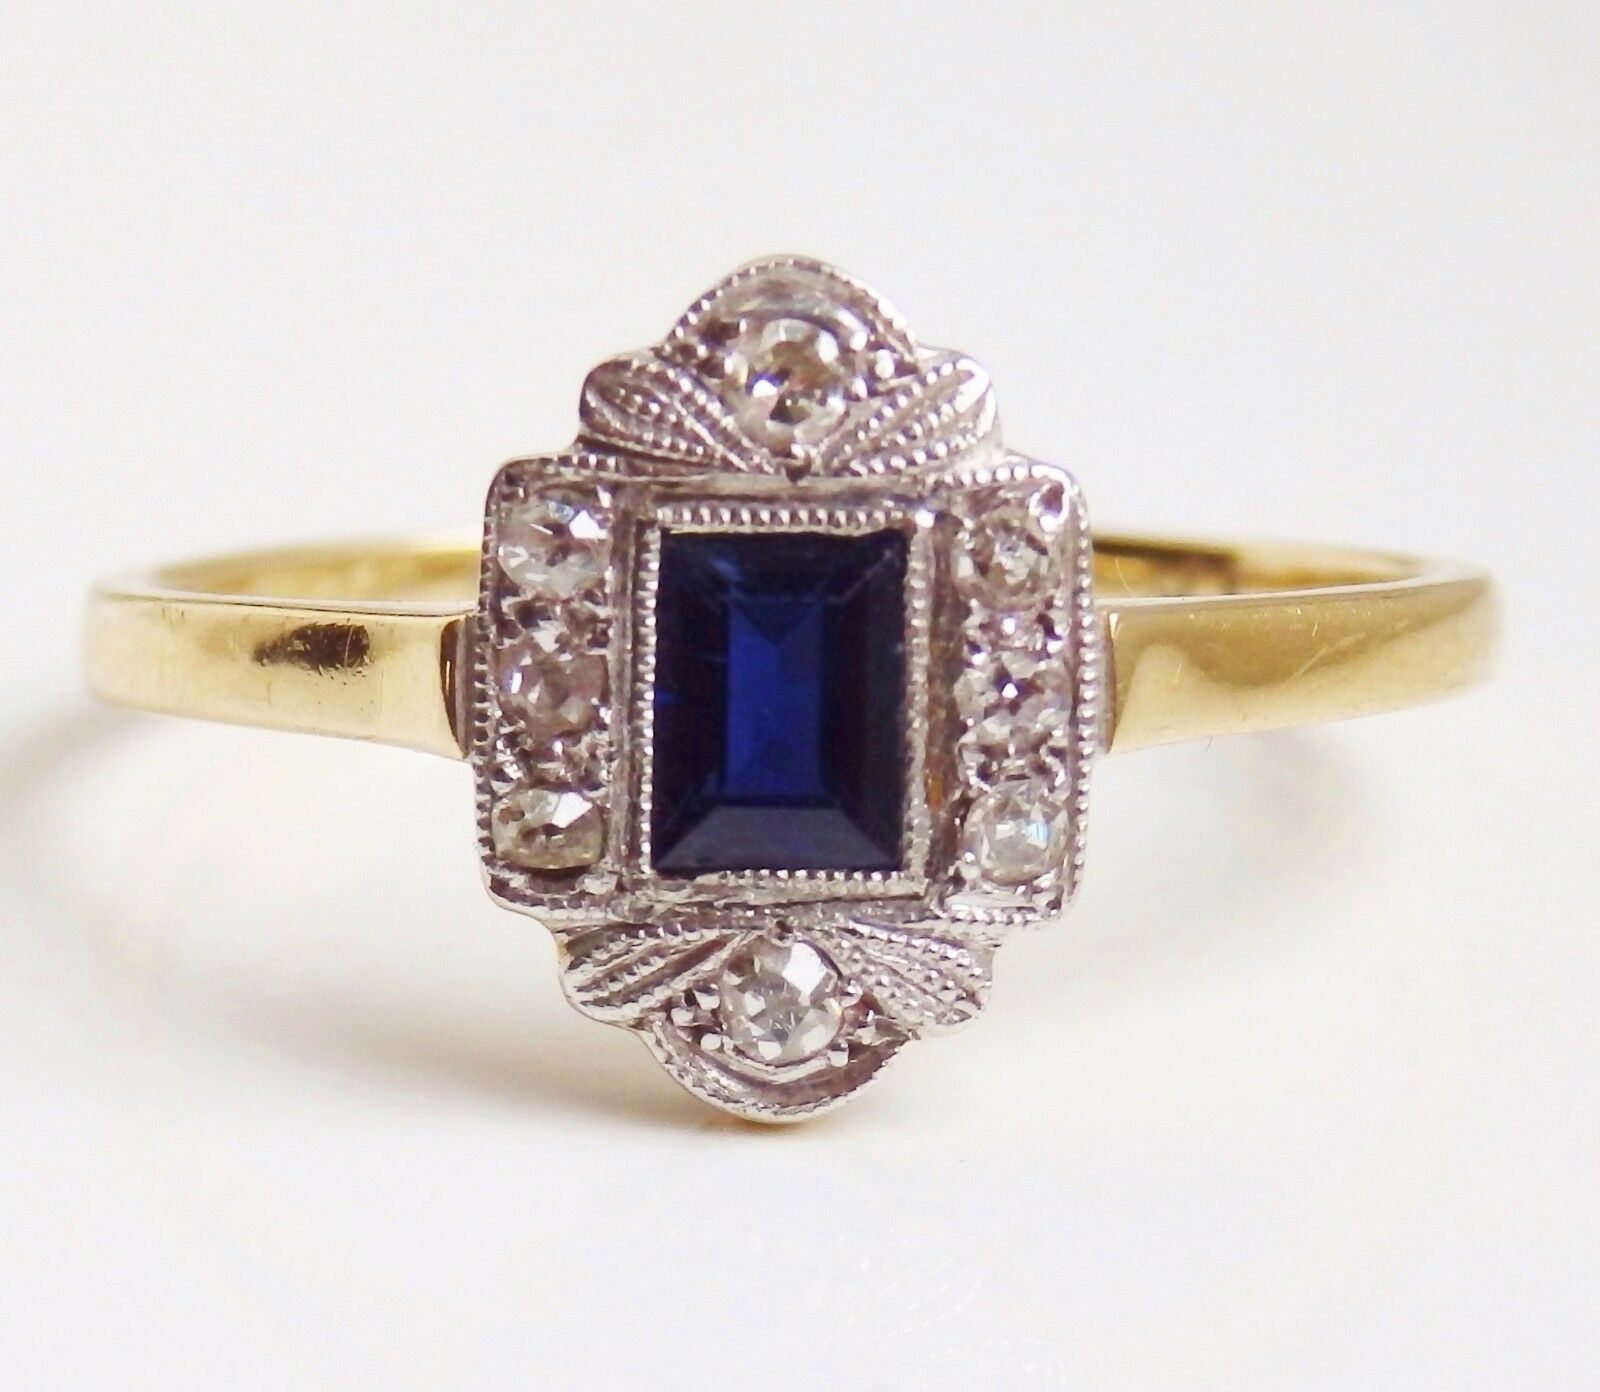 Stunning Vintage Art Deco 18ct gold Sapphire & Diamond Ring c1930; Size 'S 1 2'